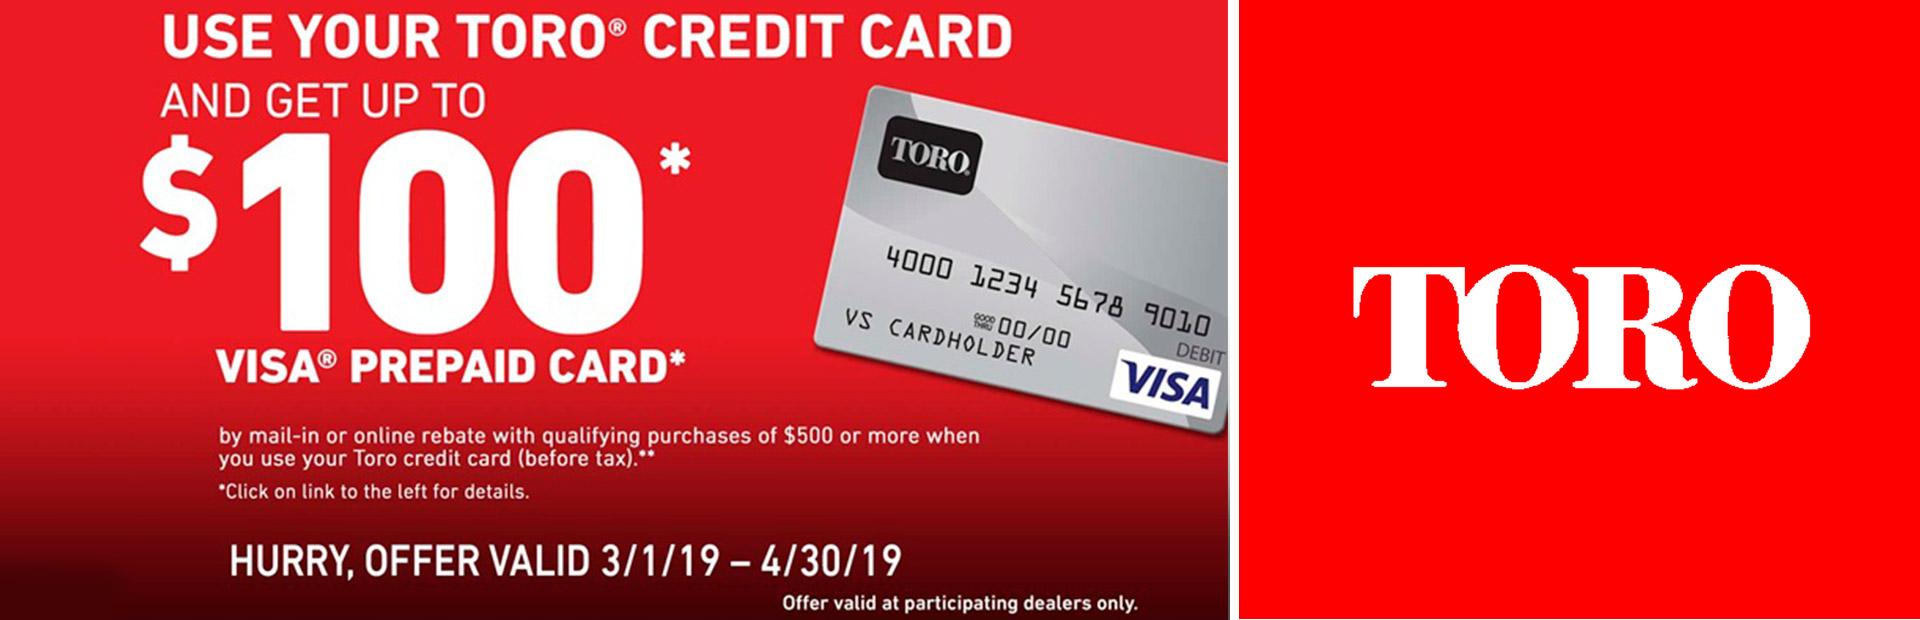 Toro Toro Visa Prepaid Card Offer Wagoner Power Equipment